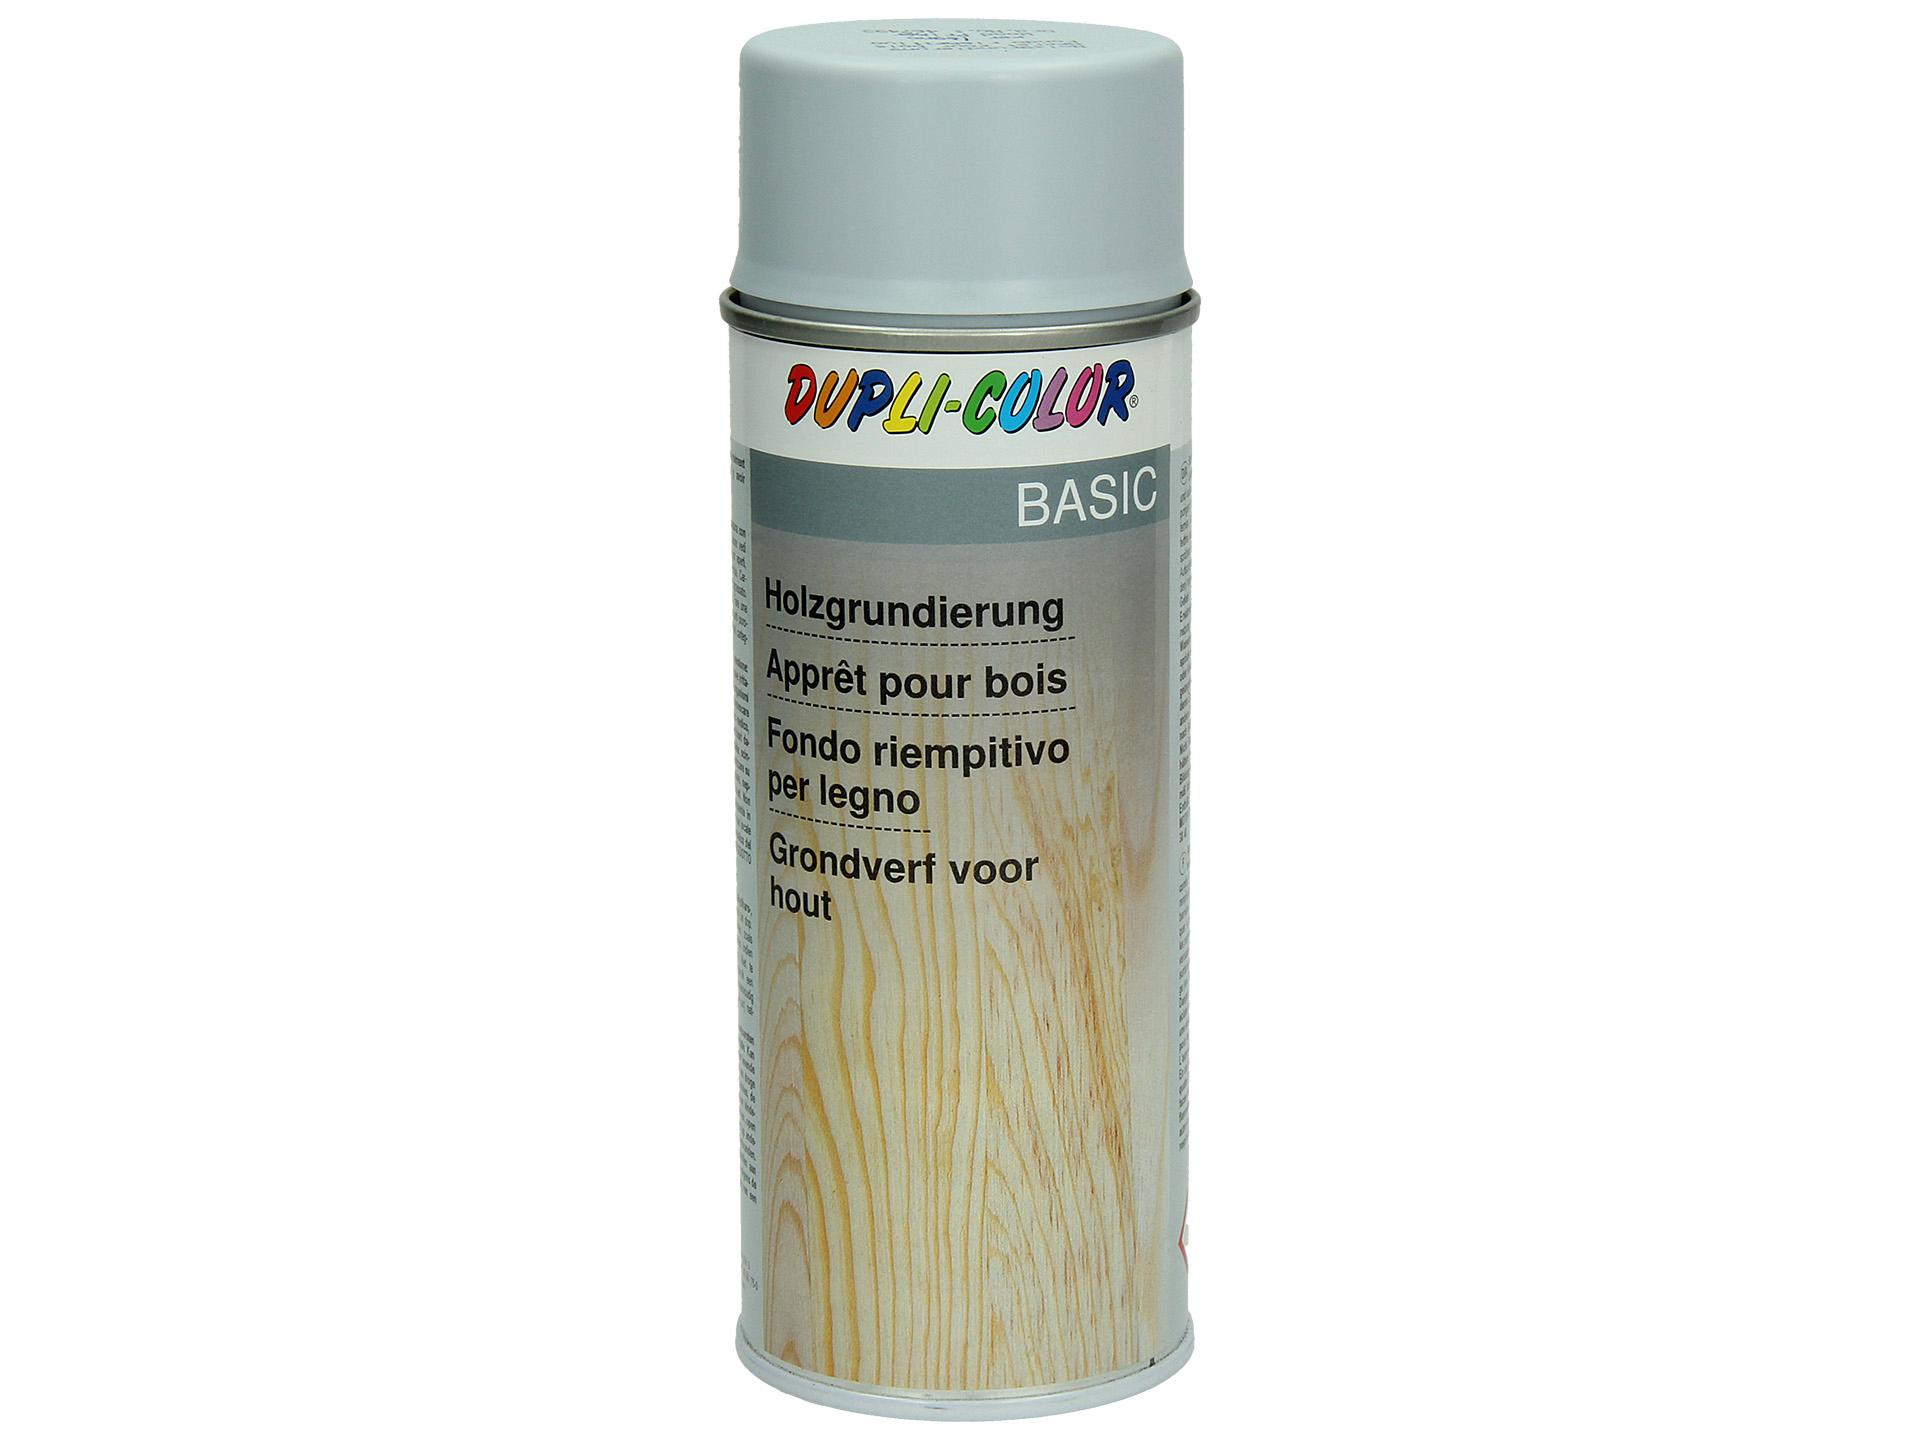 dupli color laque en spray basic grondverf voor hout 400ml gris | hubo